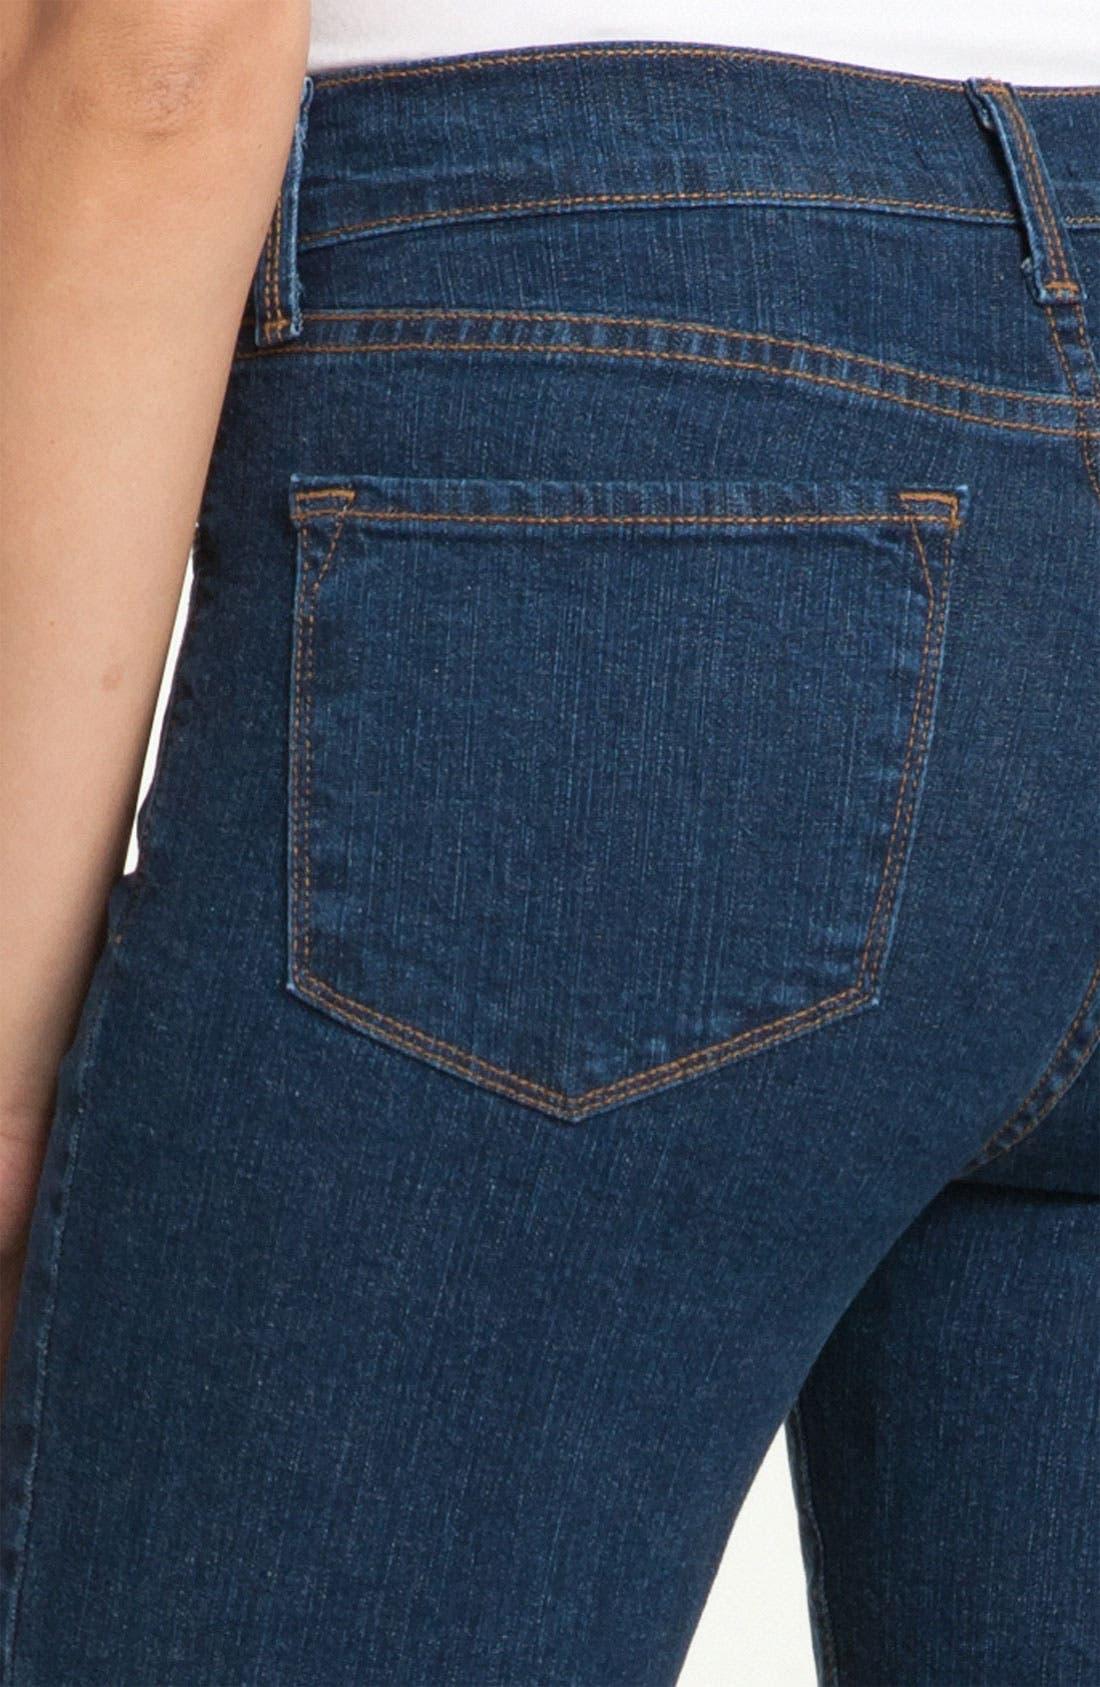 Alternate Image 3  - NYDJ 'Marilyn' Stretch Straight Leg Jeans (Denim) (Regular & Petite)